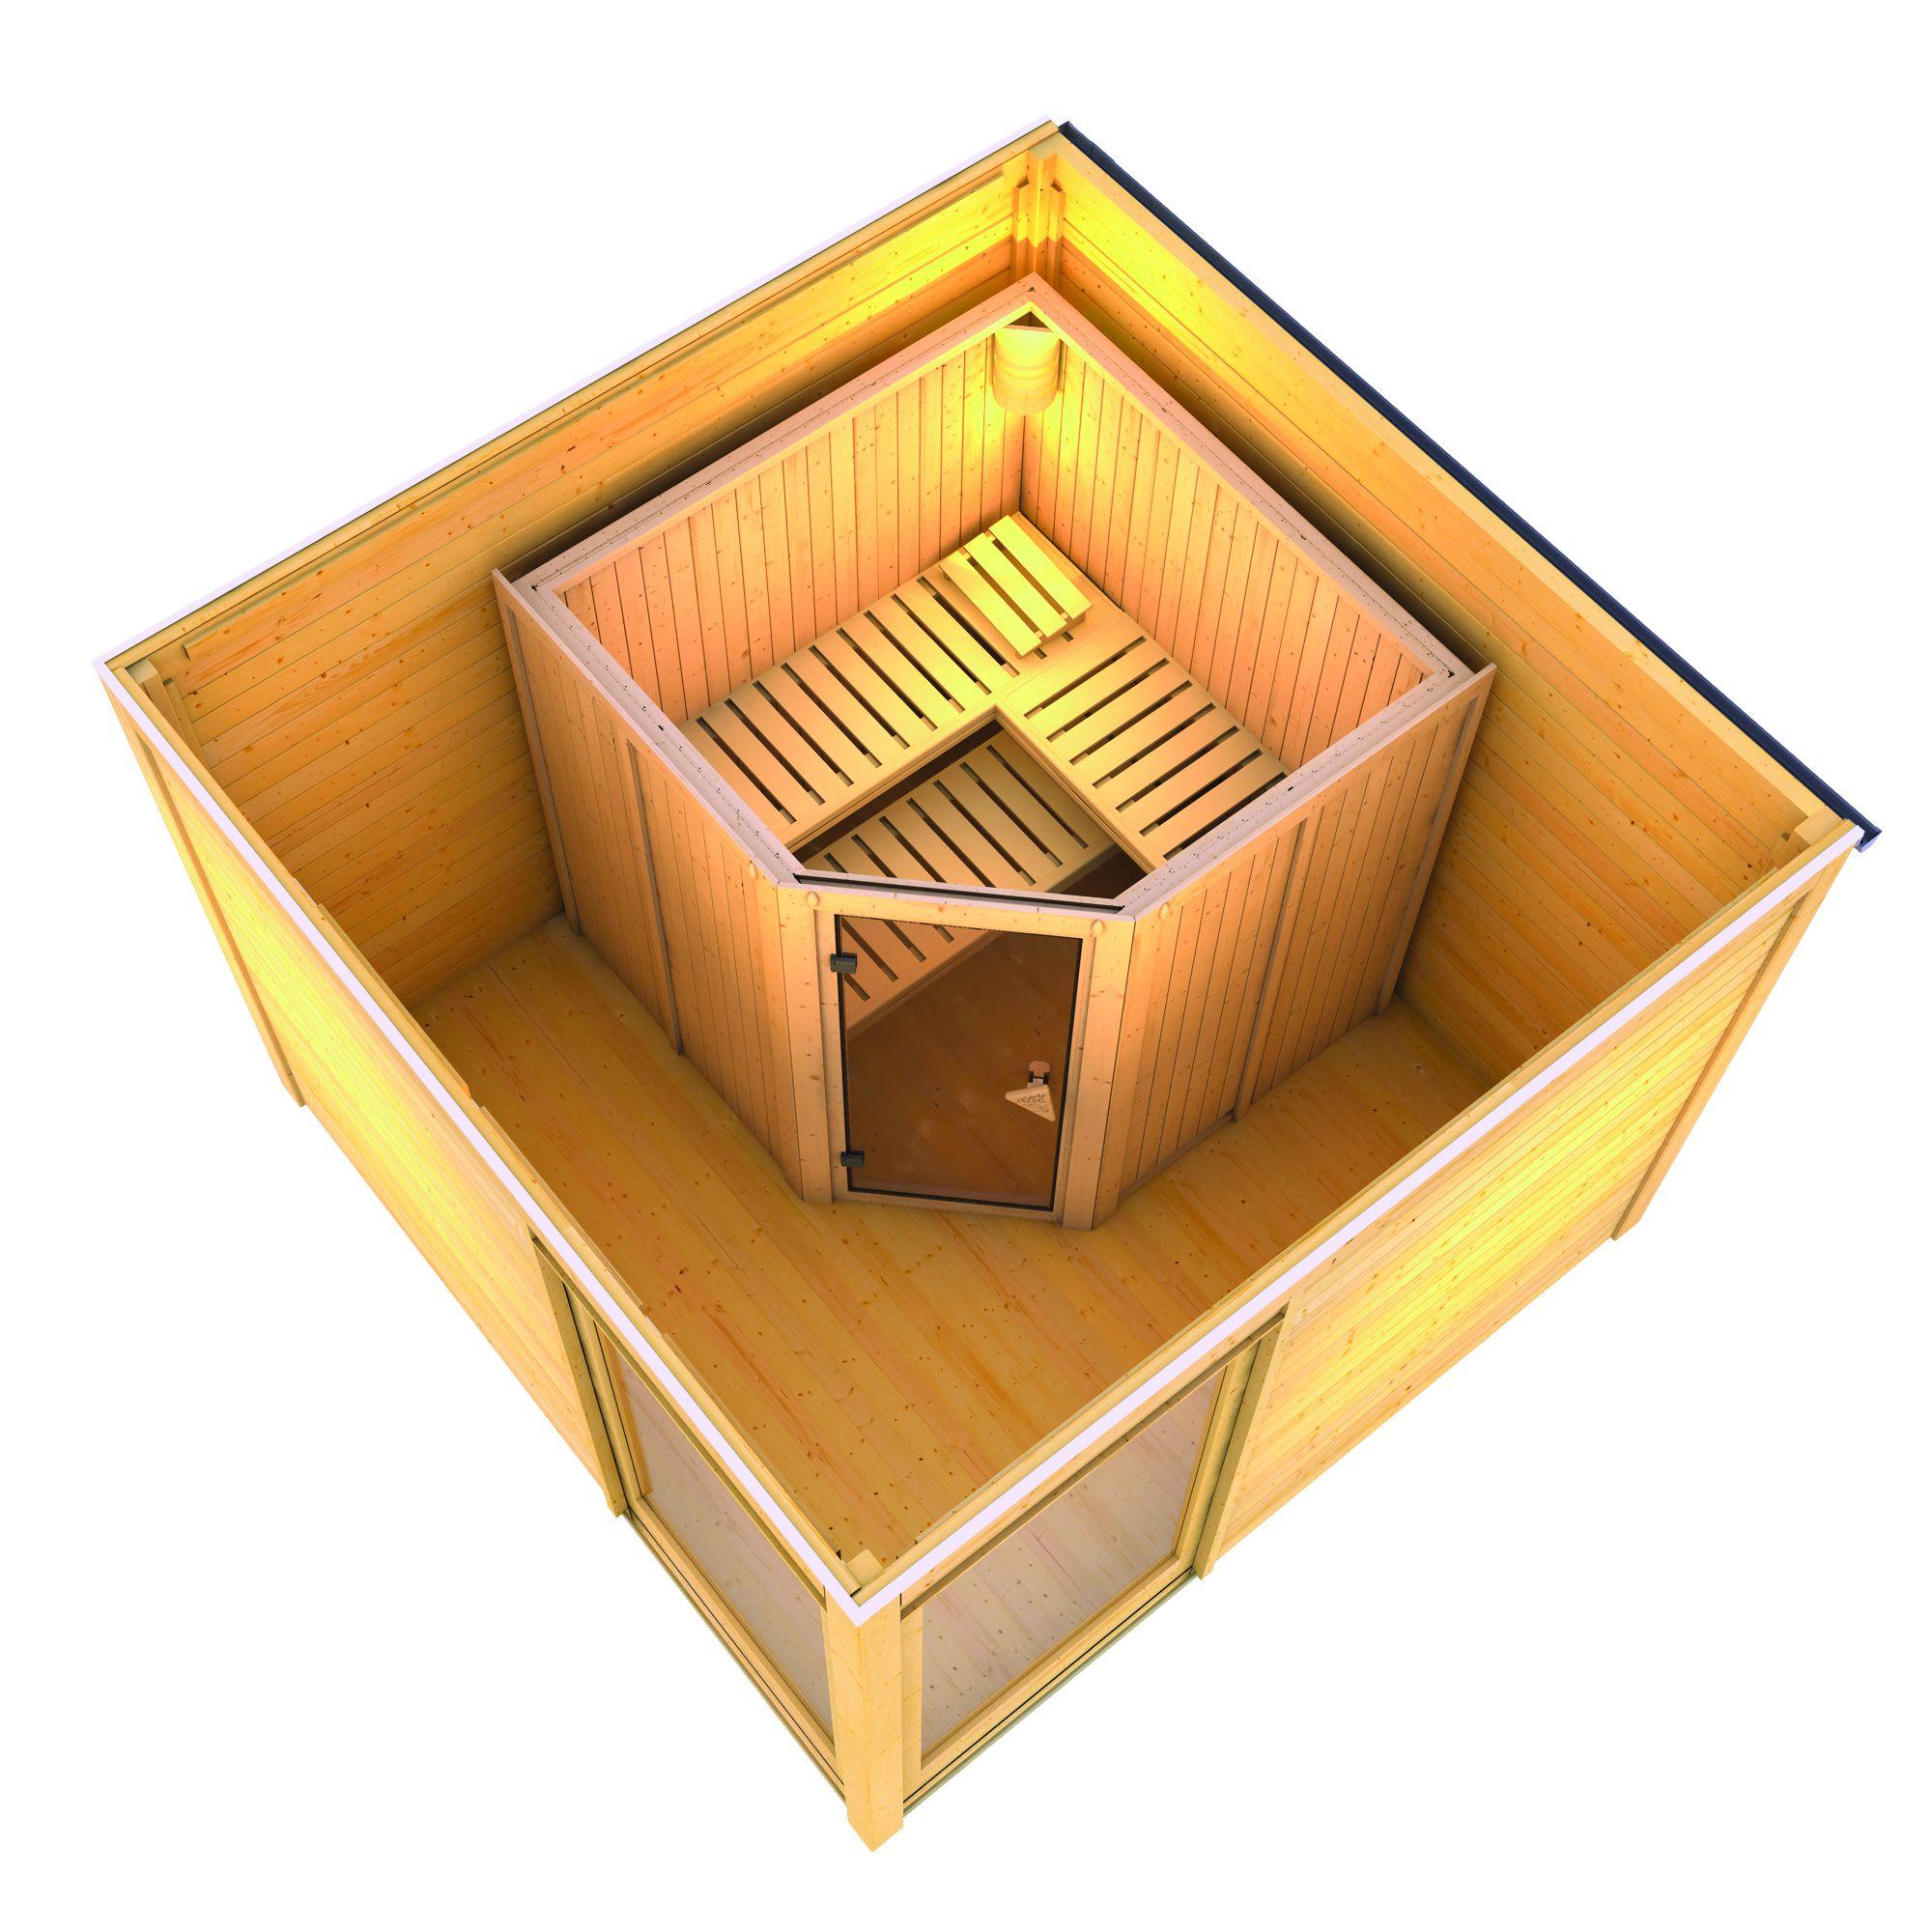 karibu sauna house cubus corner 2 3 20 x m with jarin. Black Bedroom Furniture Sets. Home Design Ideas